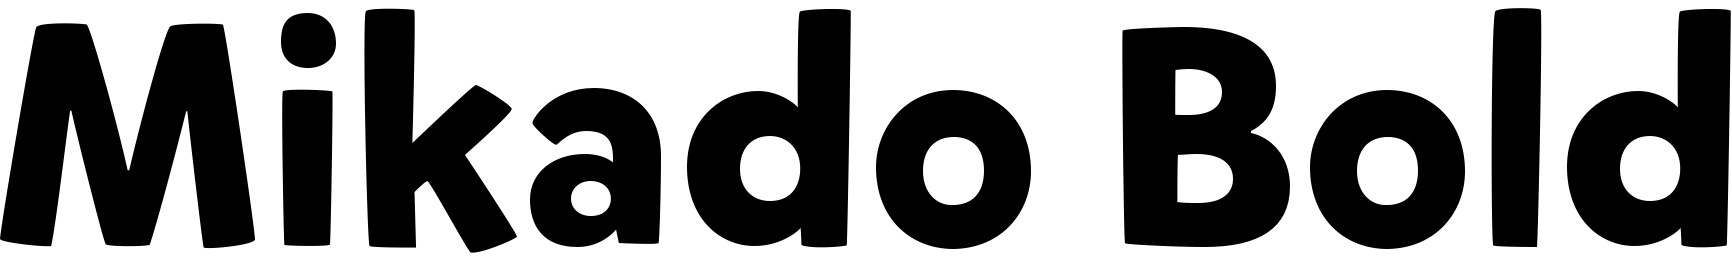 Mikado Bold